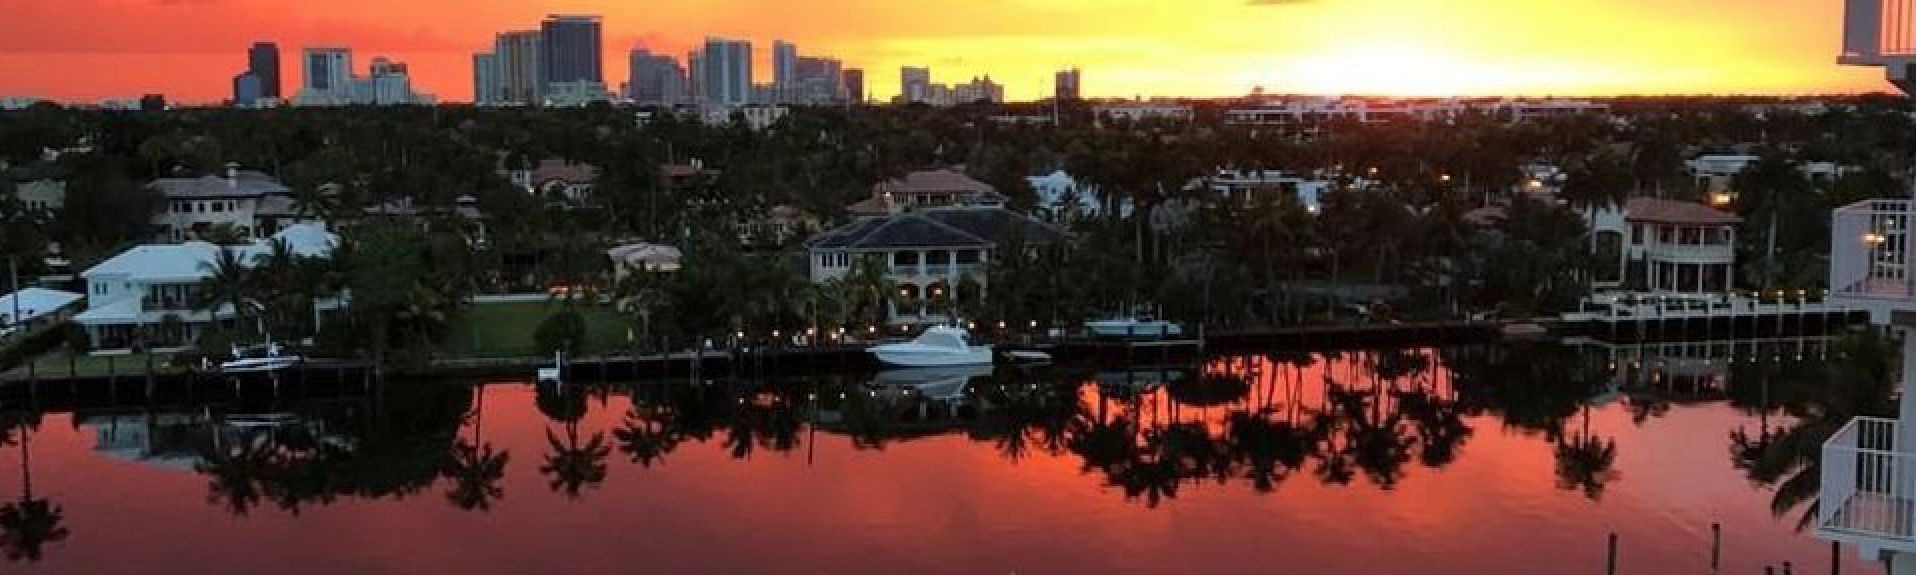 Seven Isles, Fort Lauderdale, FL, USA